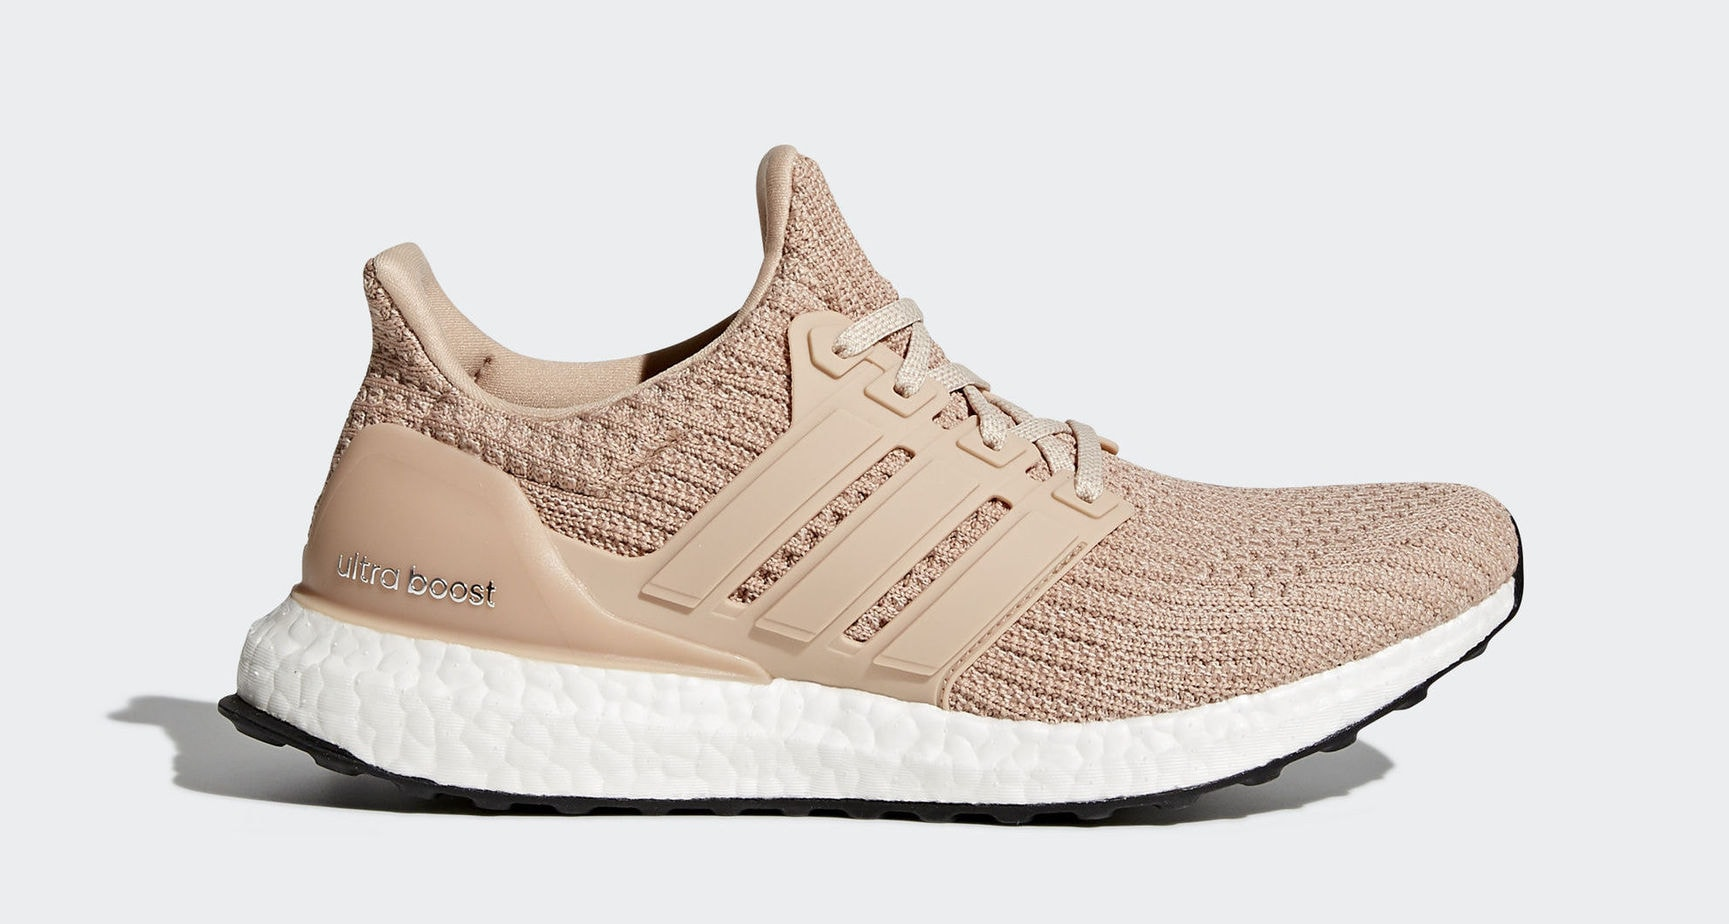 new styles 0930f 86b24 Adidas Ultra Boost 2019 Release Dates Justfreshkicks